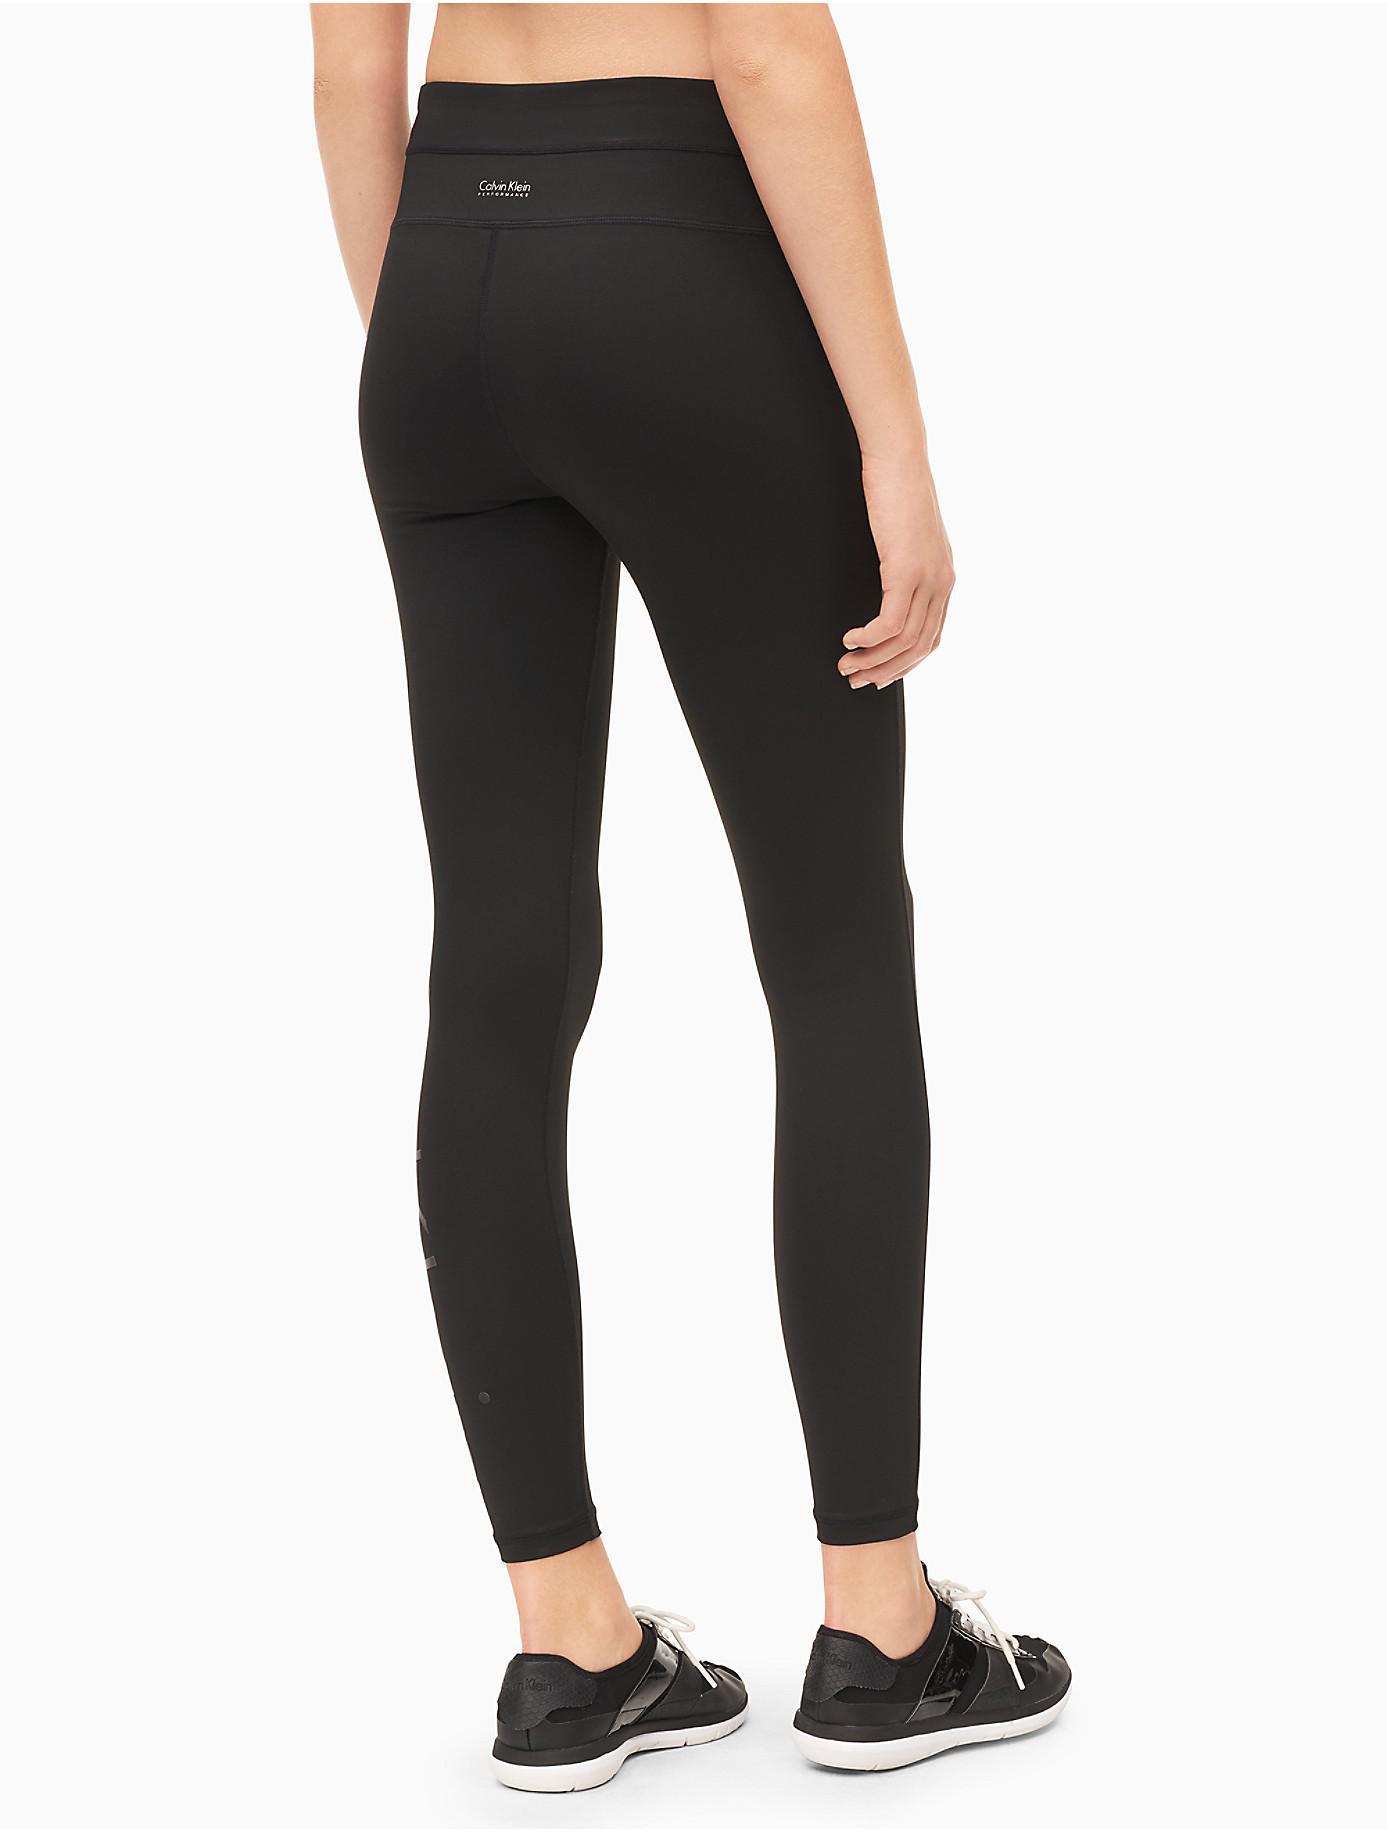 lyst calvin klein performance high waist leggings in black. Black Bedroom Furniture Sets. Home Design Ideas